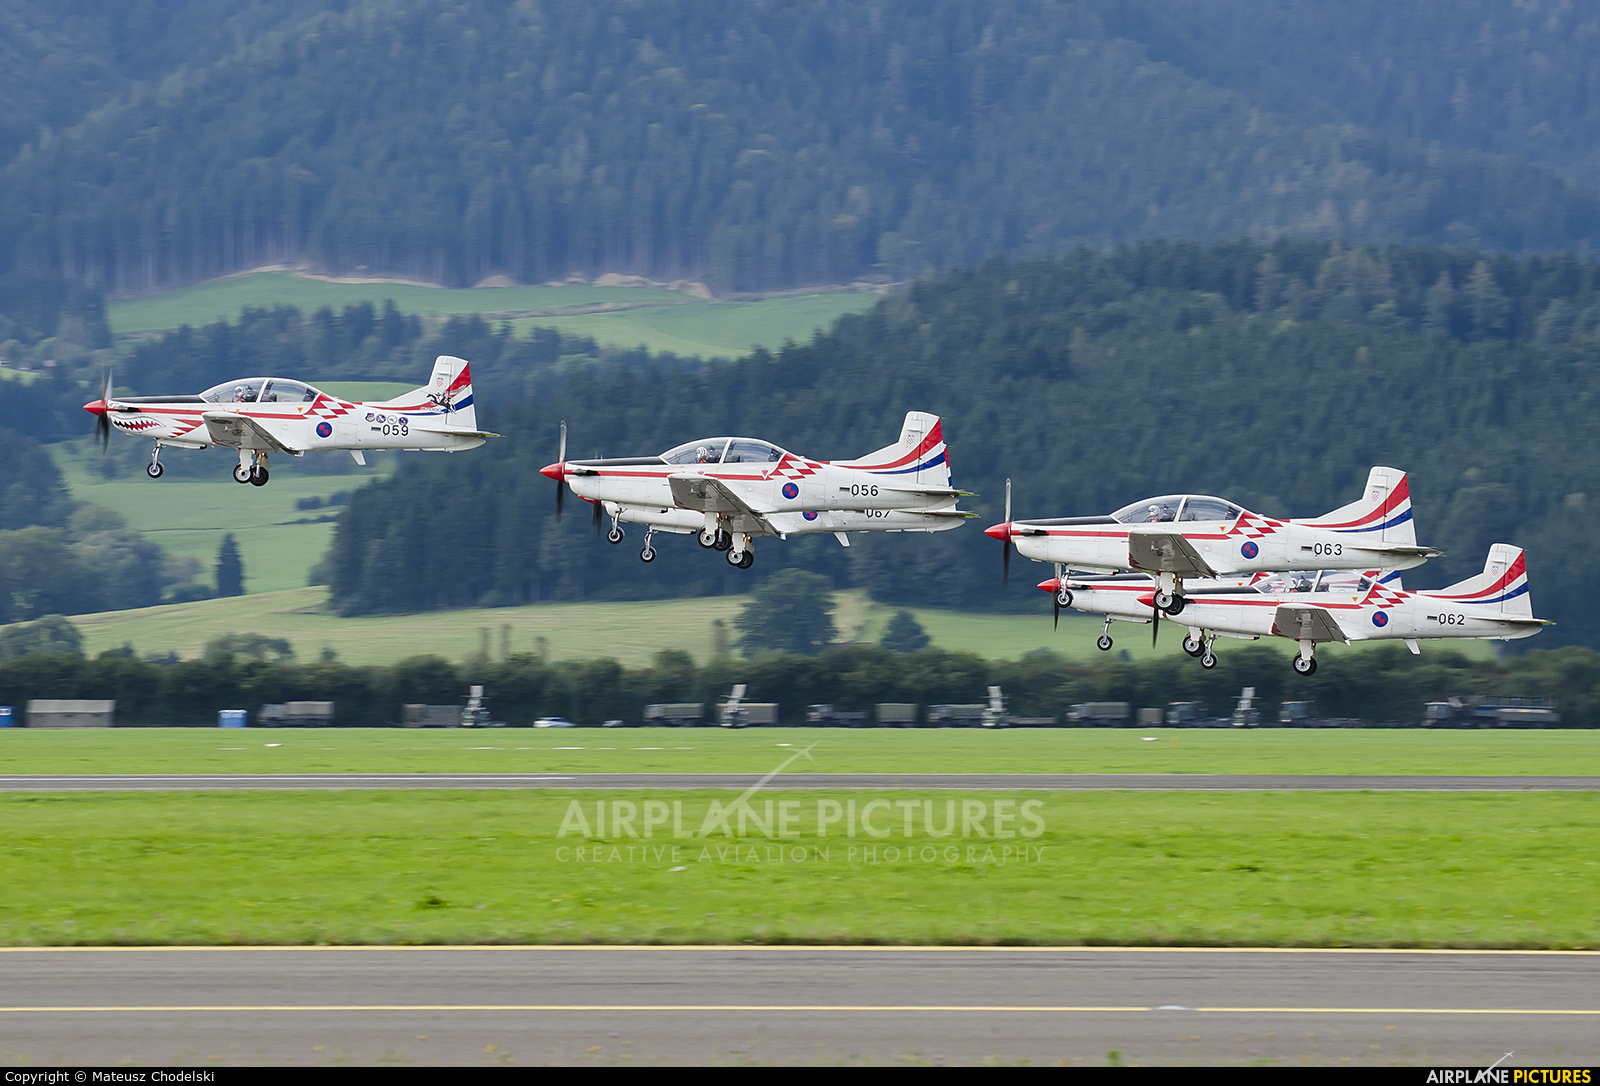 Croatia - Air Force 059 aircraft at Zeltweg